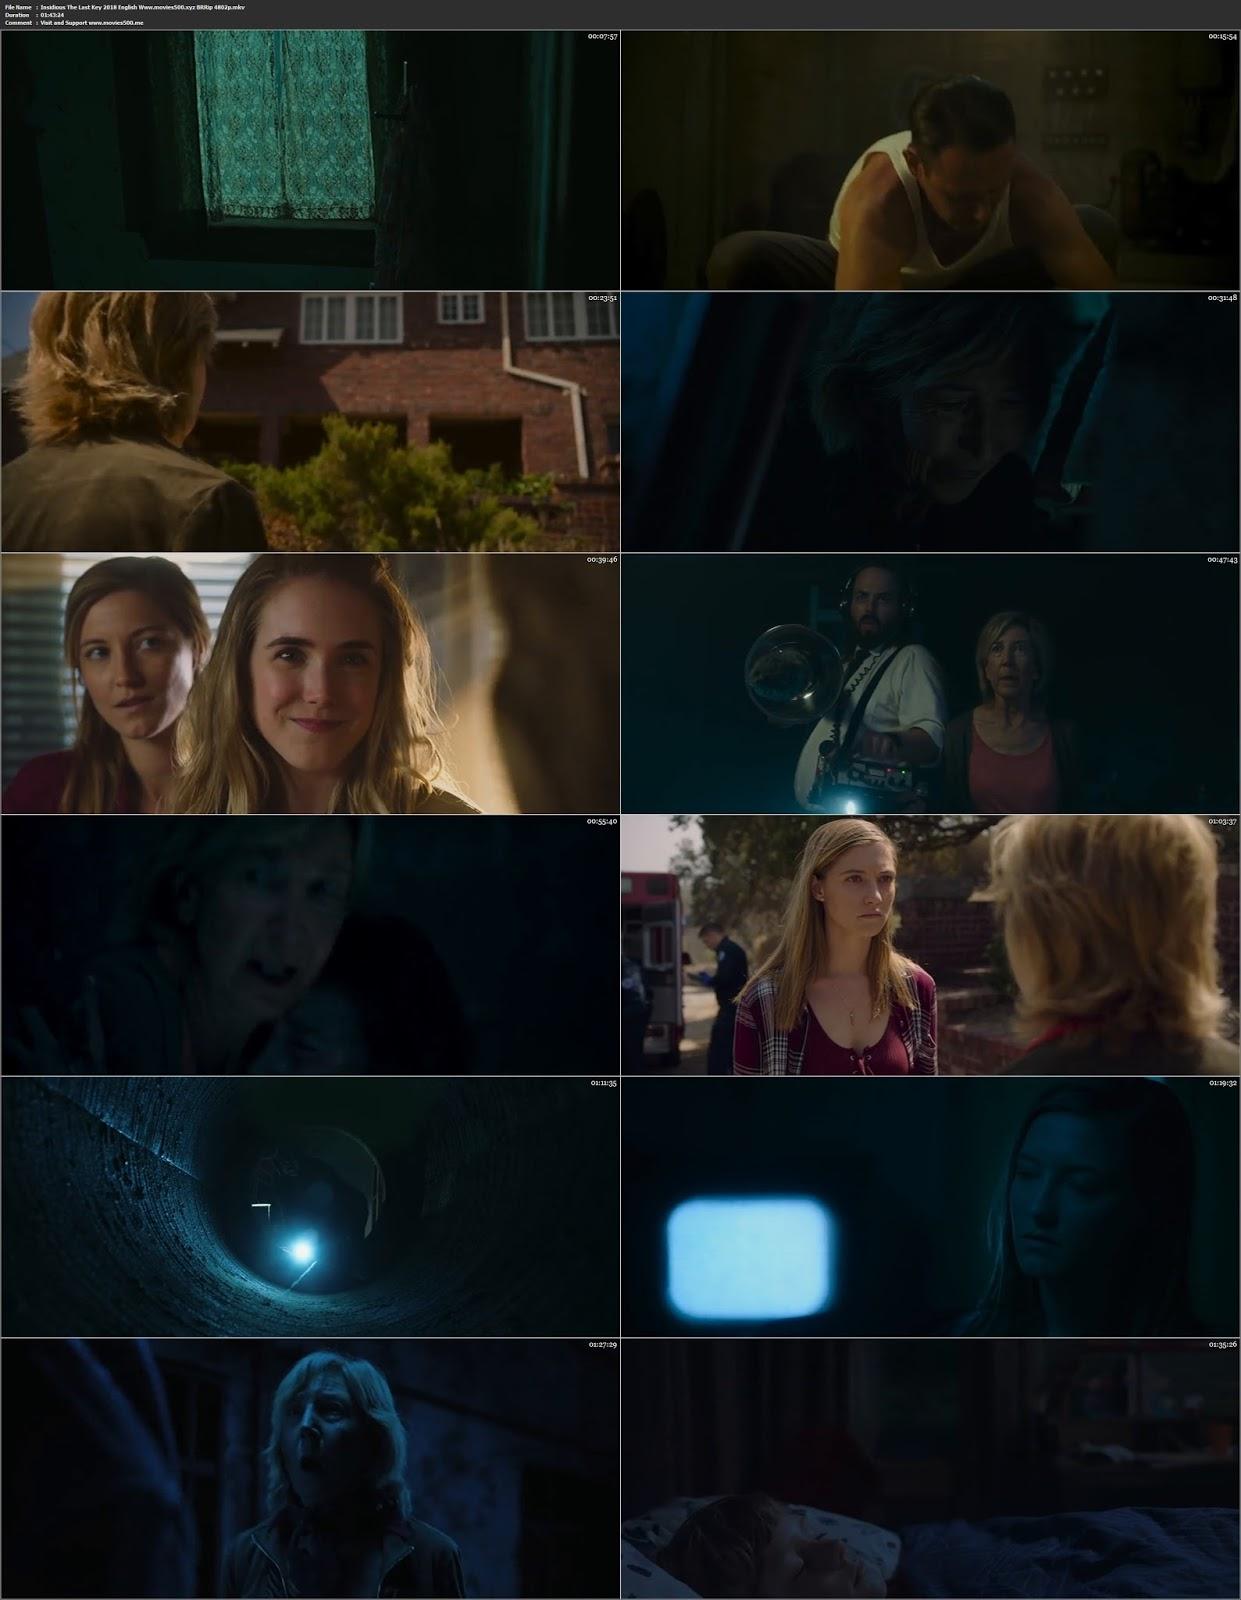 Insidious The Last Key 2018 Hollywood 300MB BluRay 480p ESubs at 9966132.com